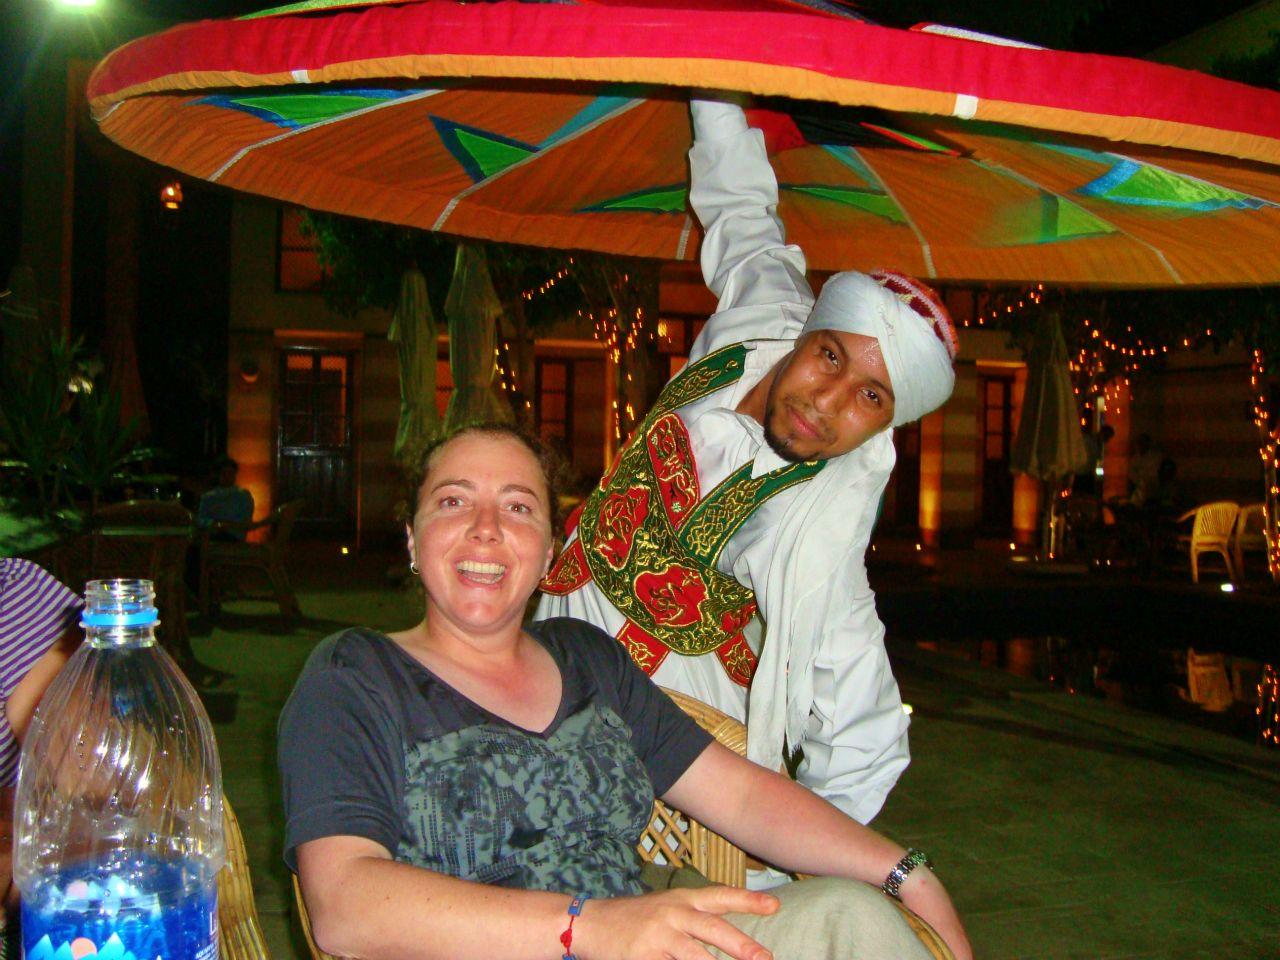 Cena con espectaculo de bailarines derviches en Egipto